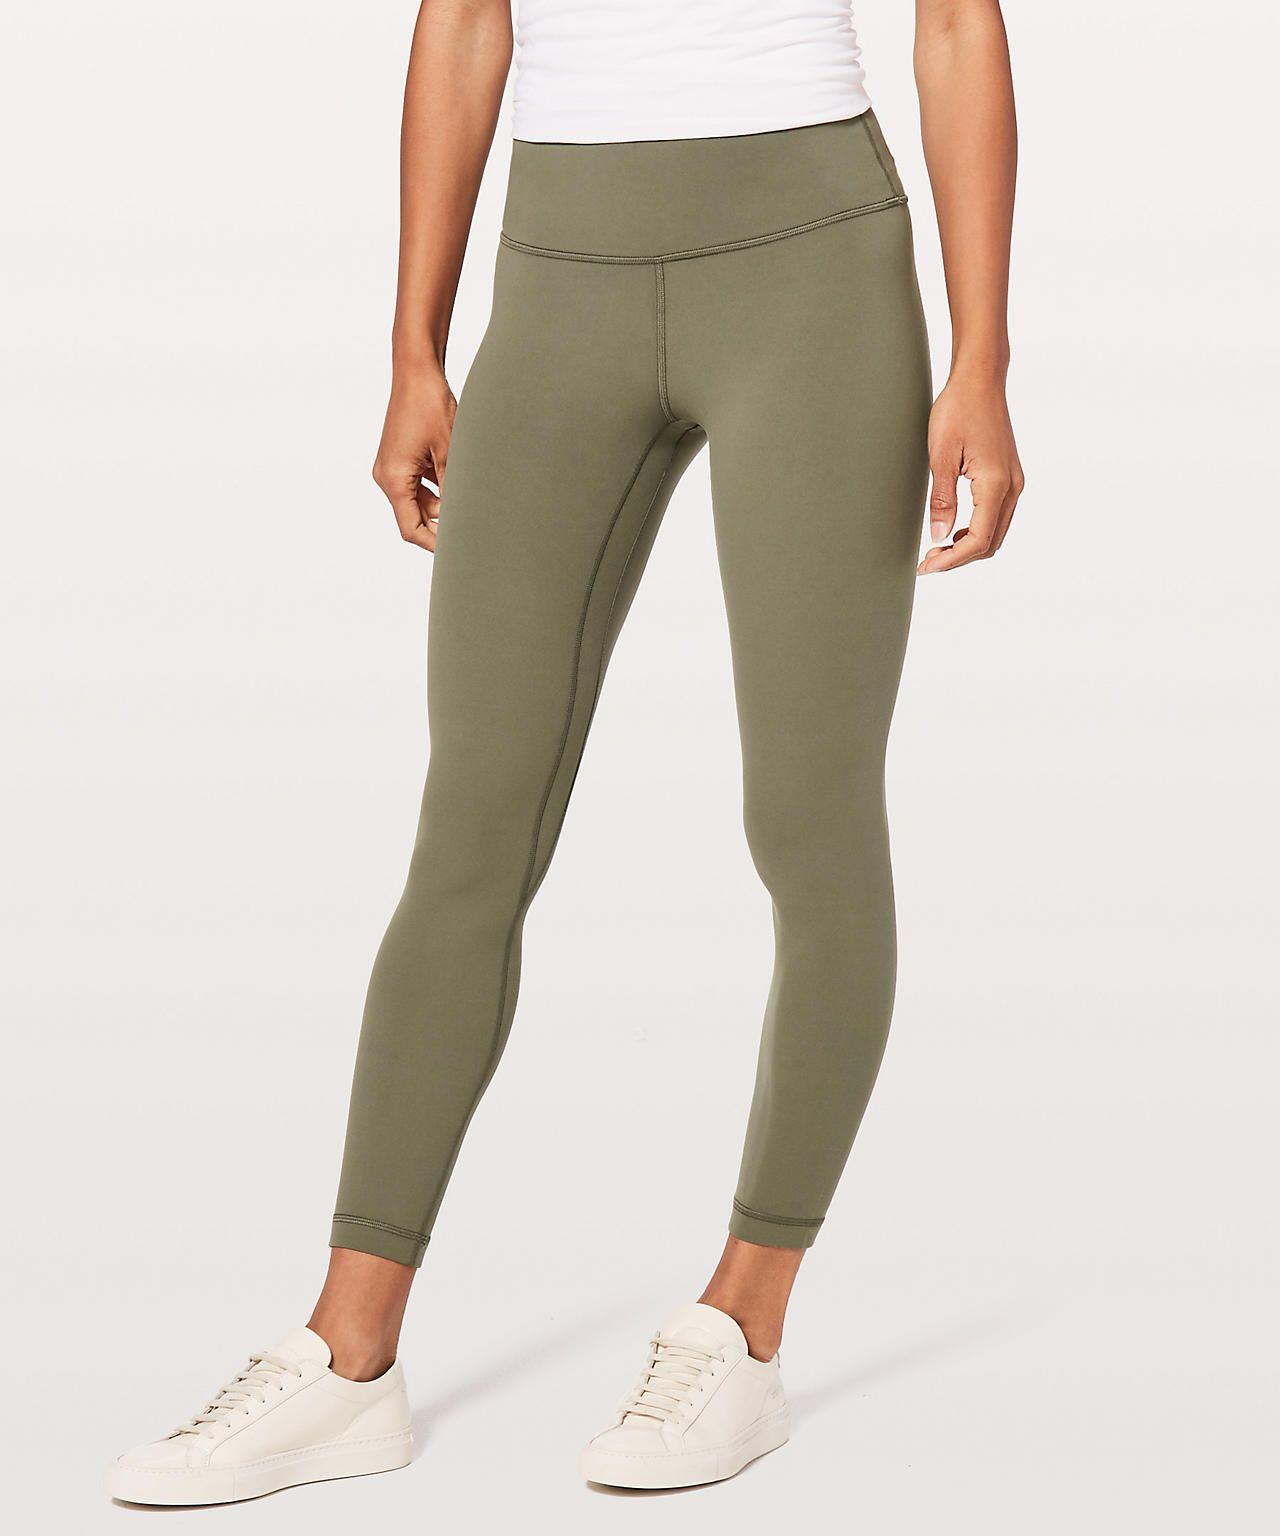 "d1cce39aef Align Pant II - 25"" Sage | Lululemon ❤ in 2019 | Pants, Yoga pants ..."